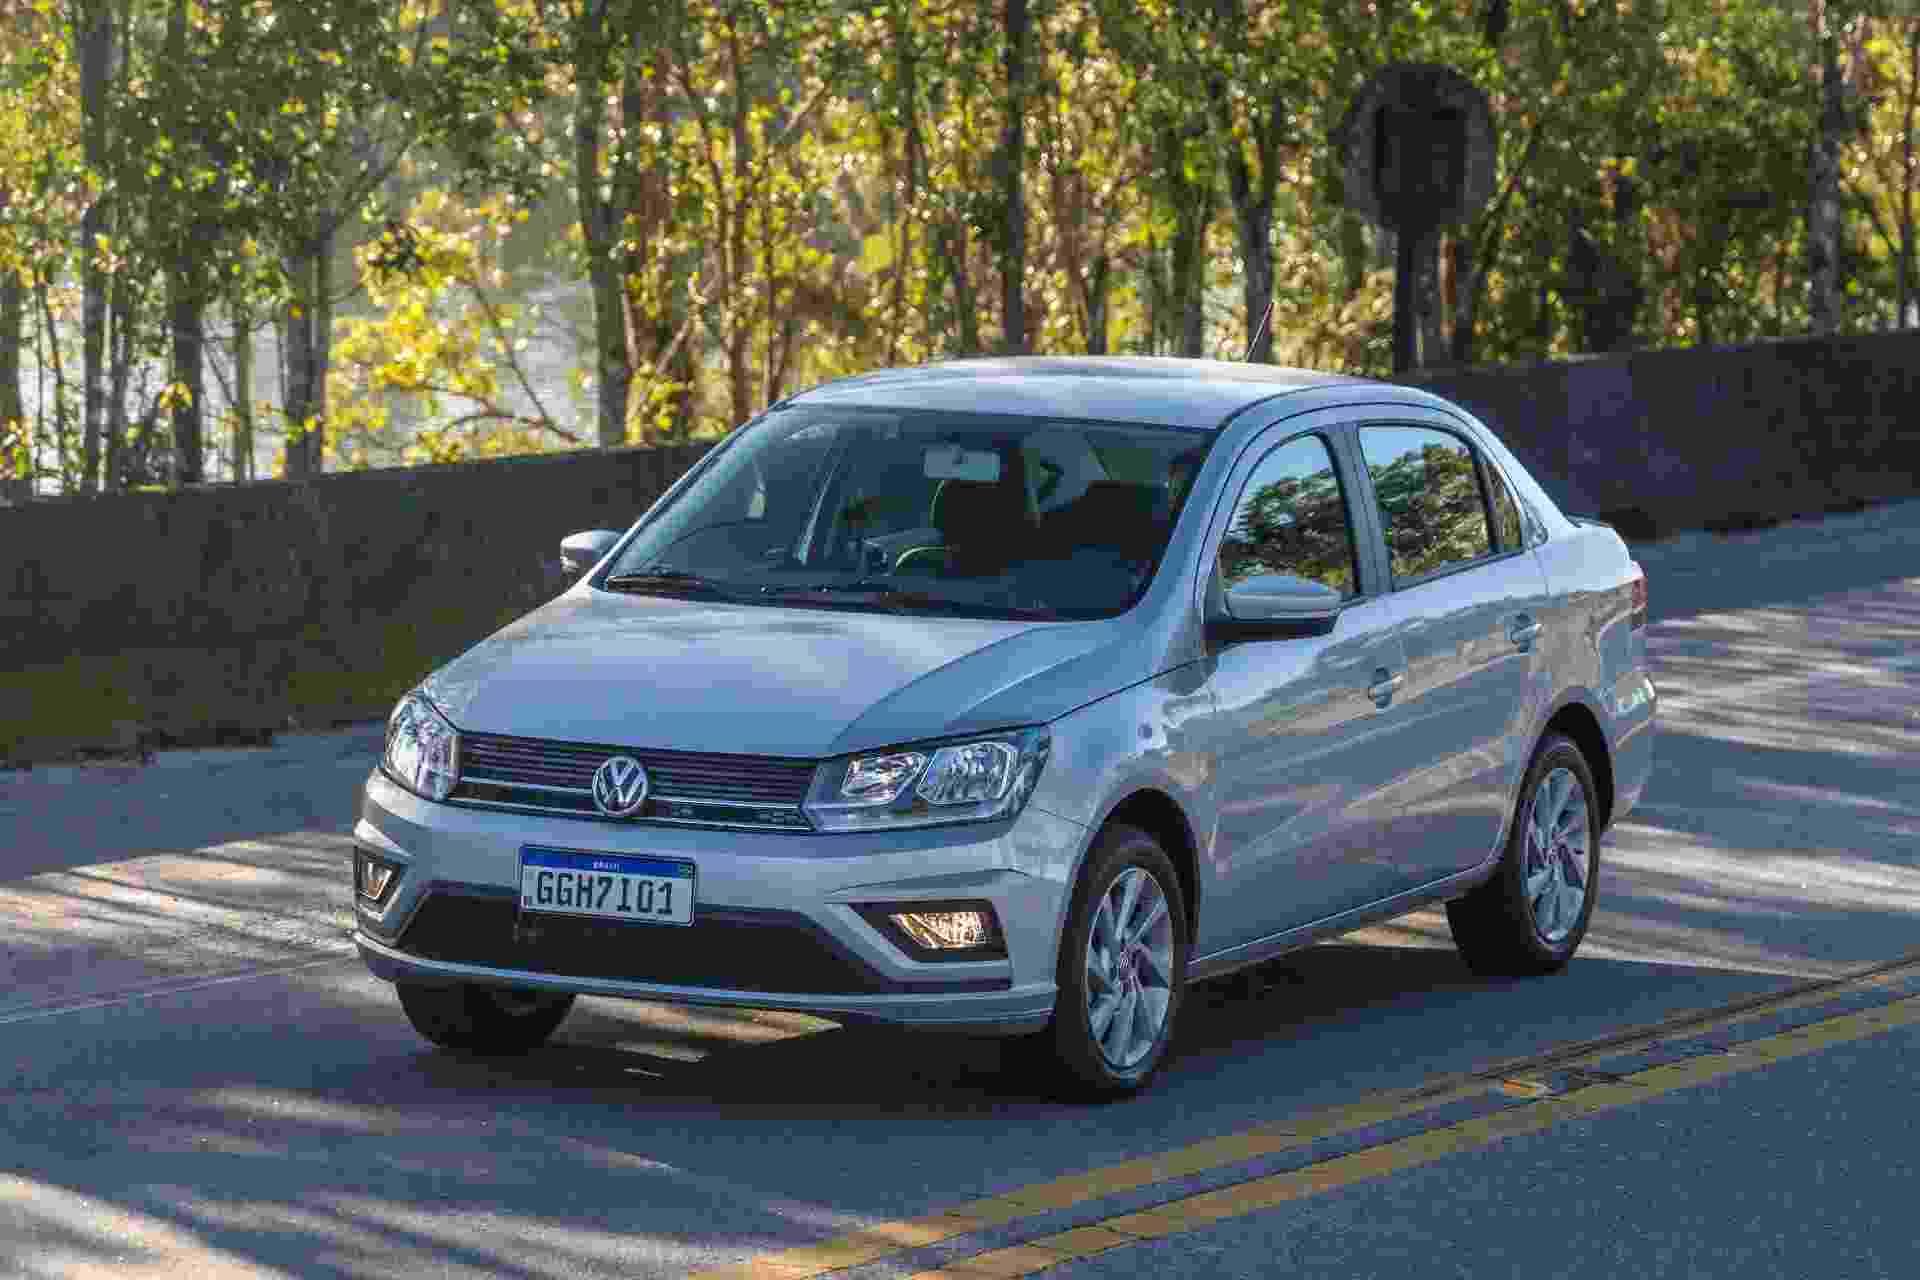 VW Voyage 1.6 AT 1 - Simon Plejtinak/UOL